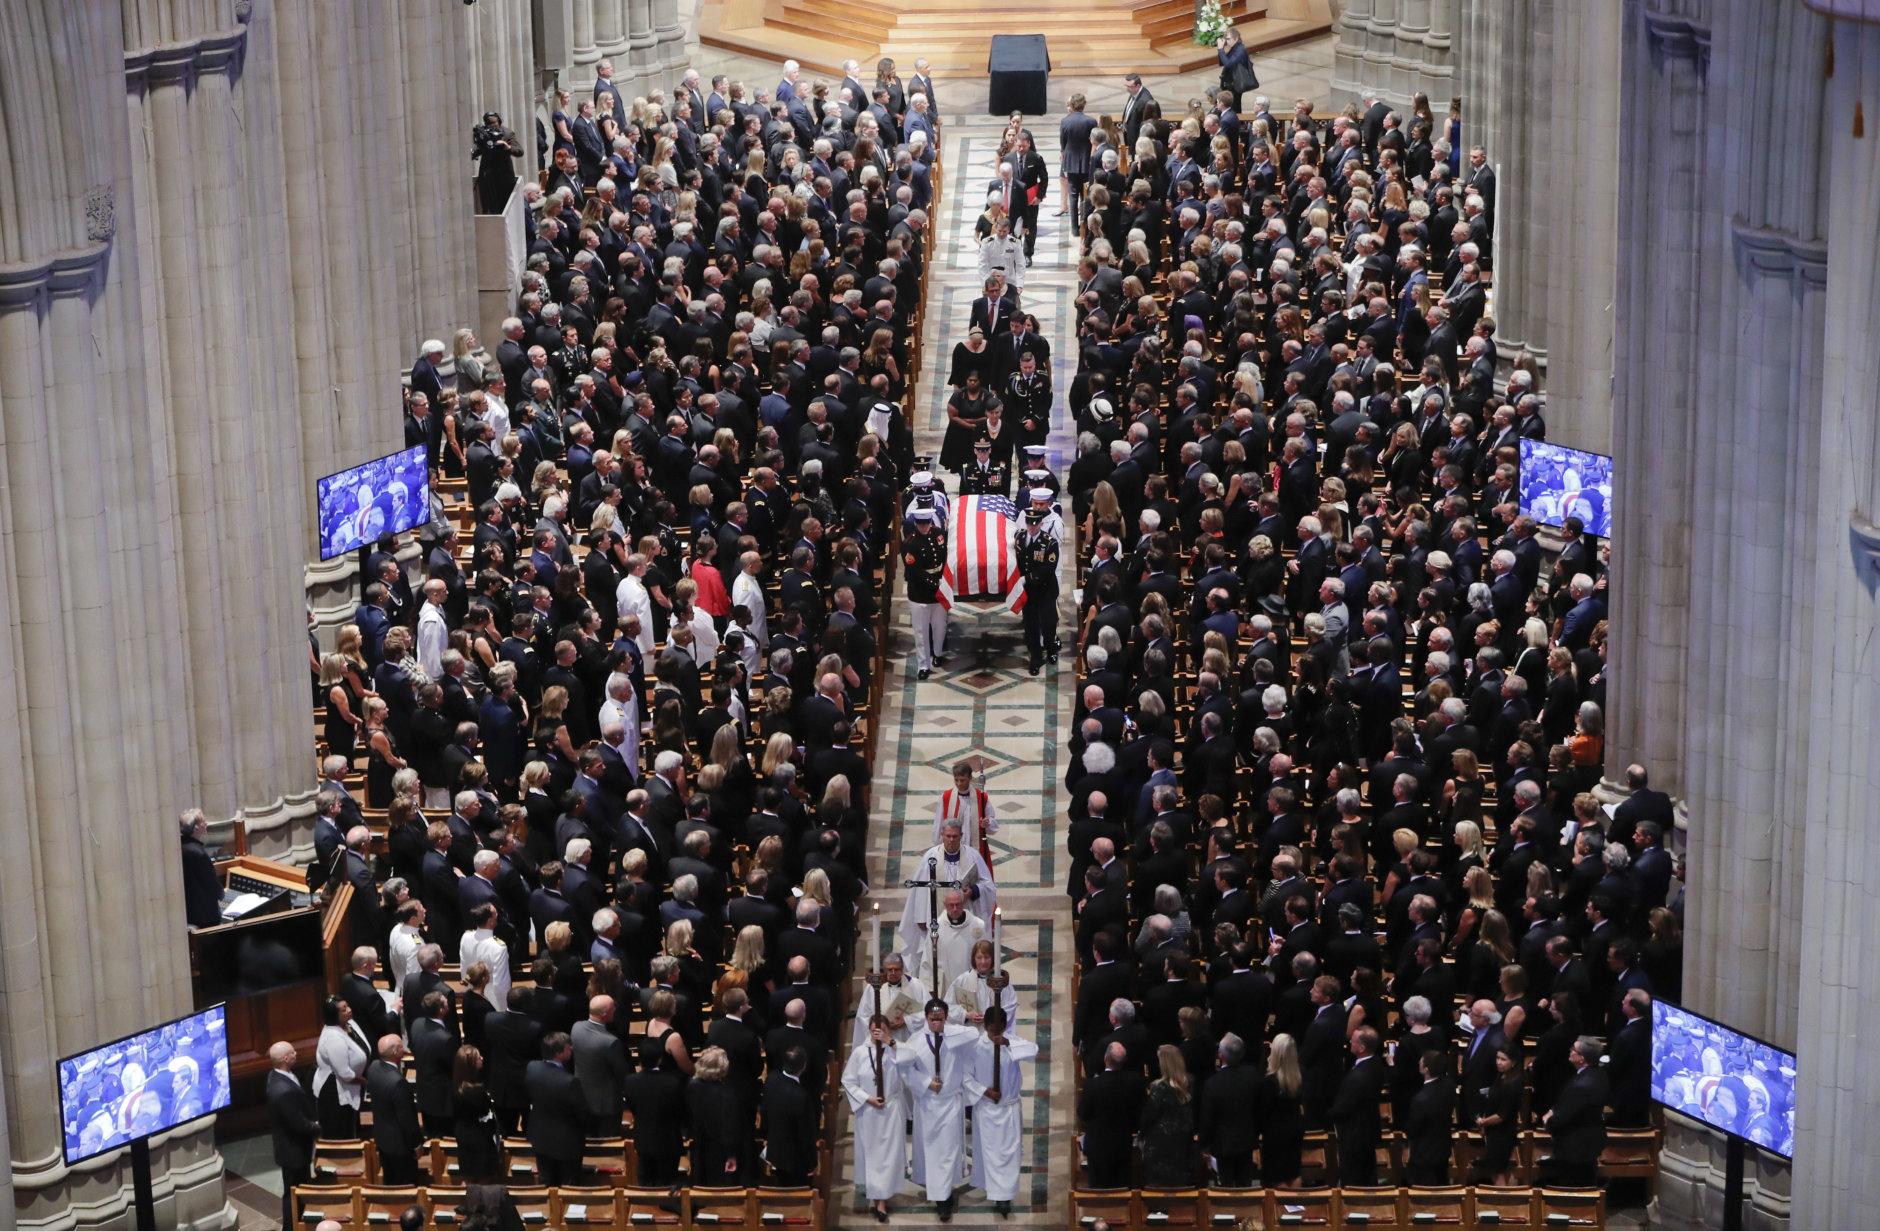 Made me better': Family, friends honor McCain at Washington